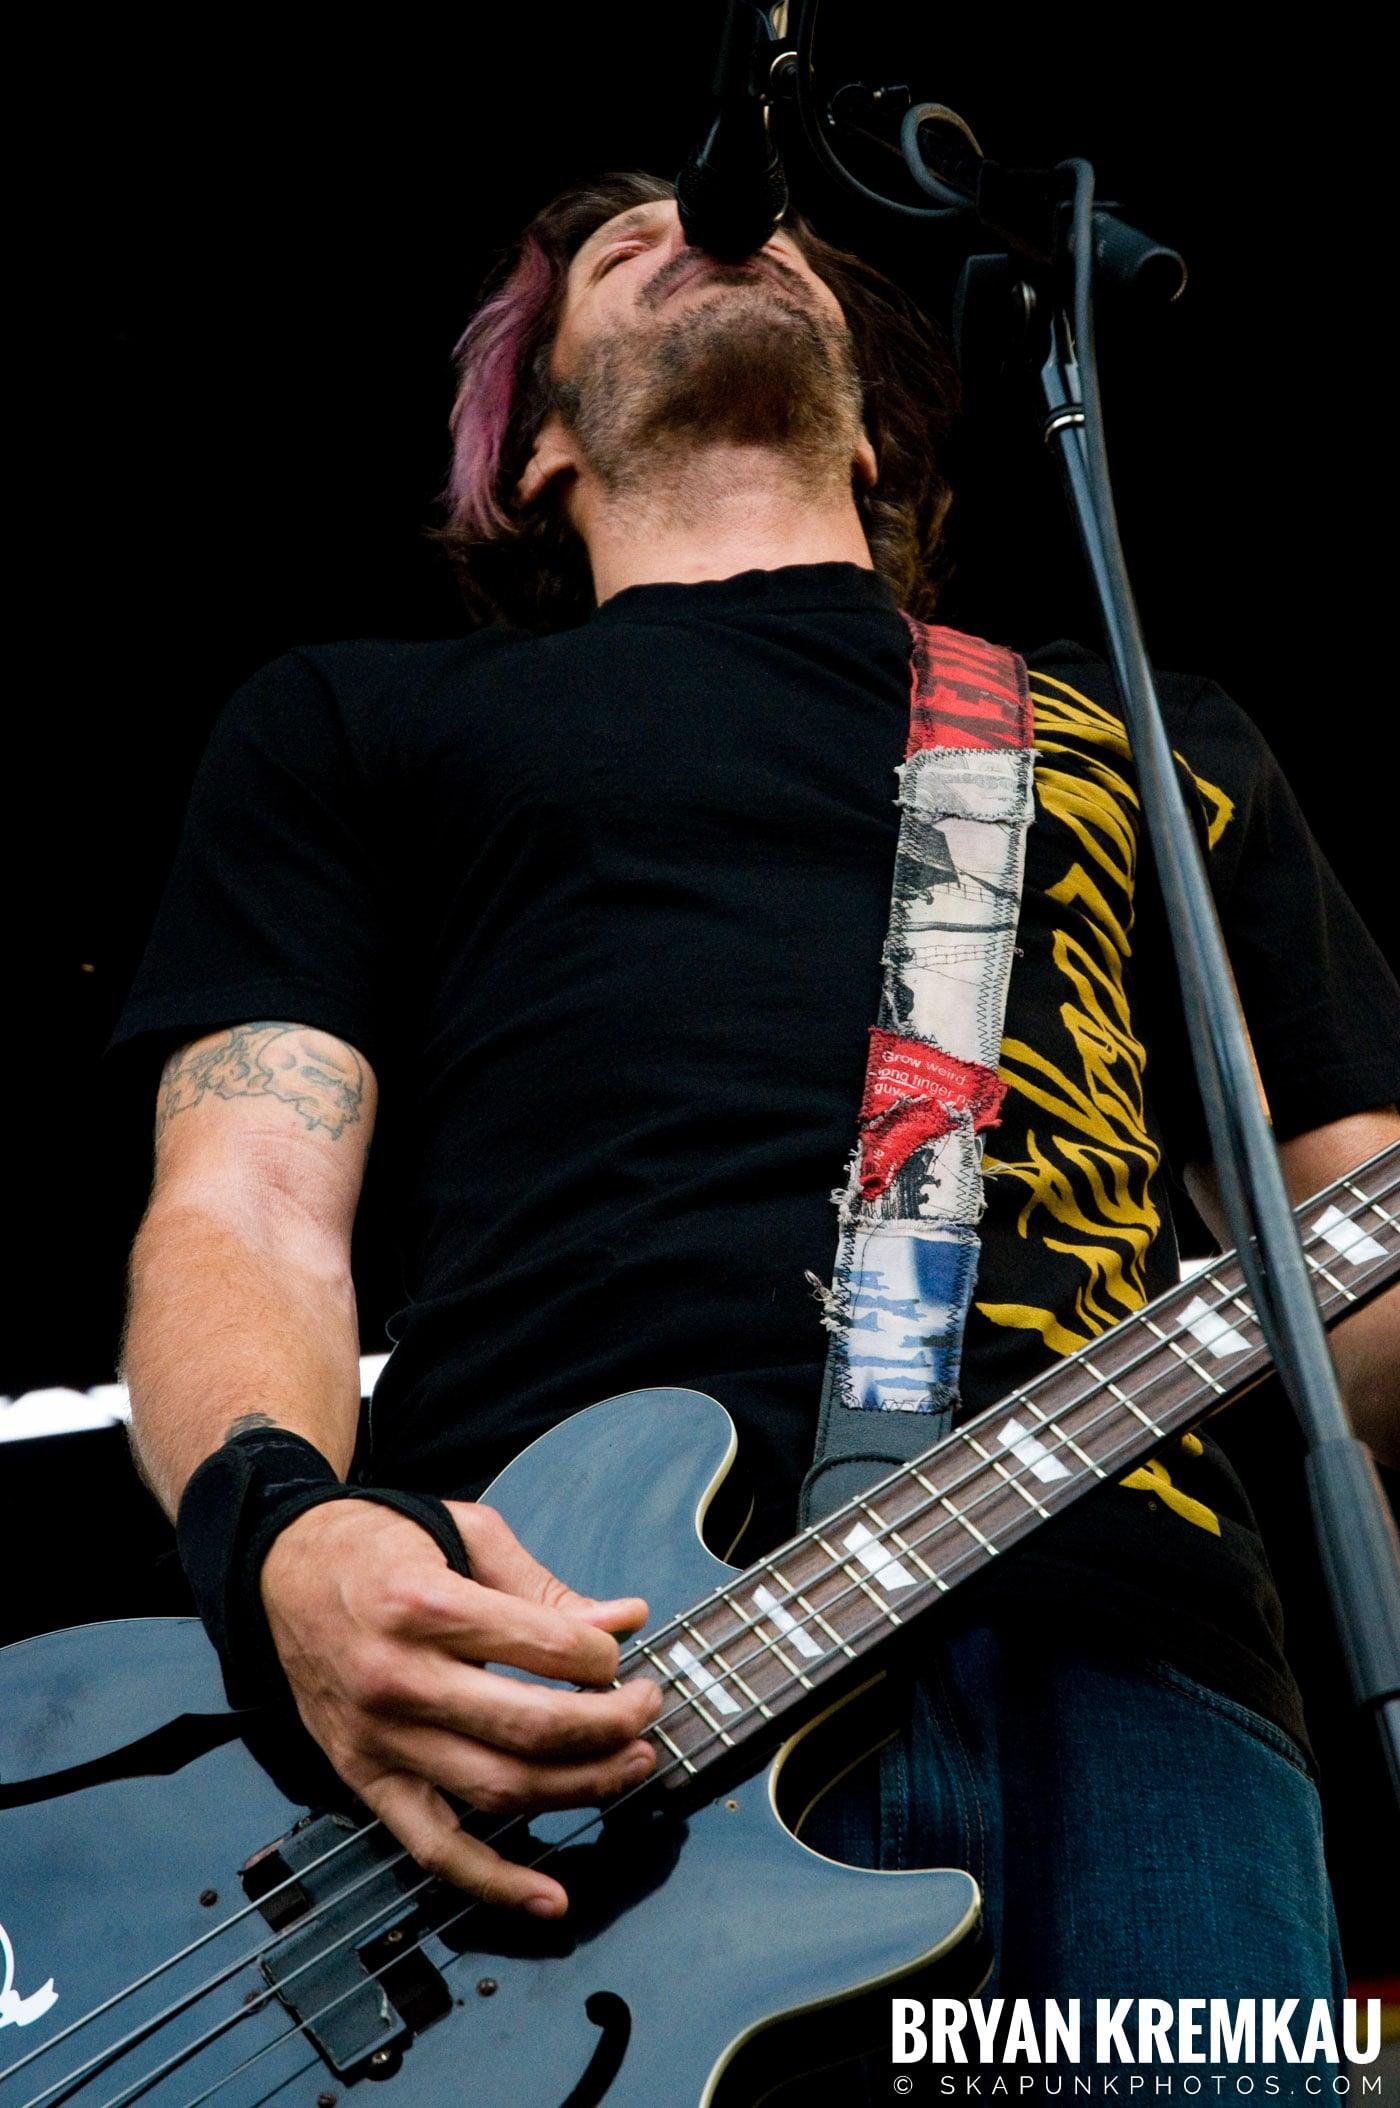 Bad Religion @ Warped Tour 2009, Scranton PA - 07.15.09 (12)